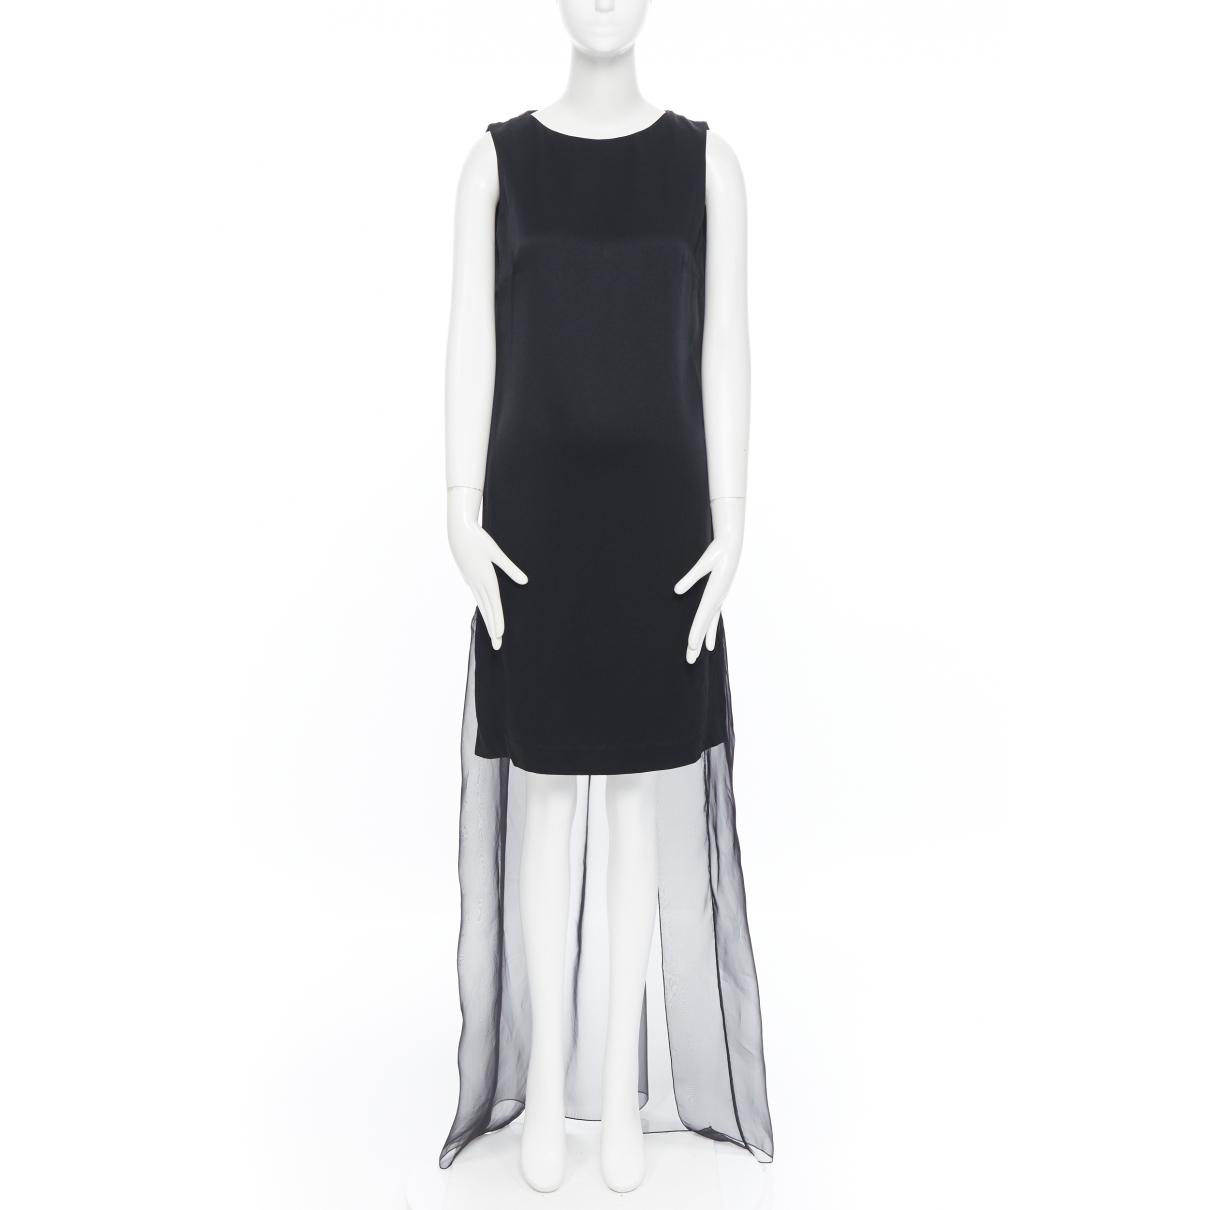 Dries Van Noten \N Black dress for Women 36 FR